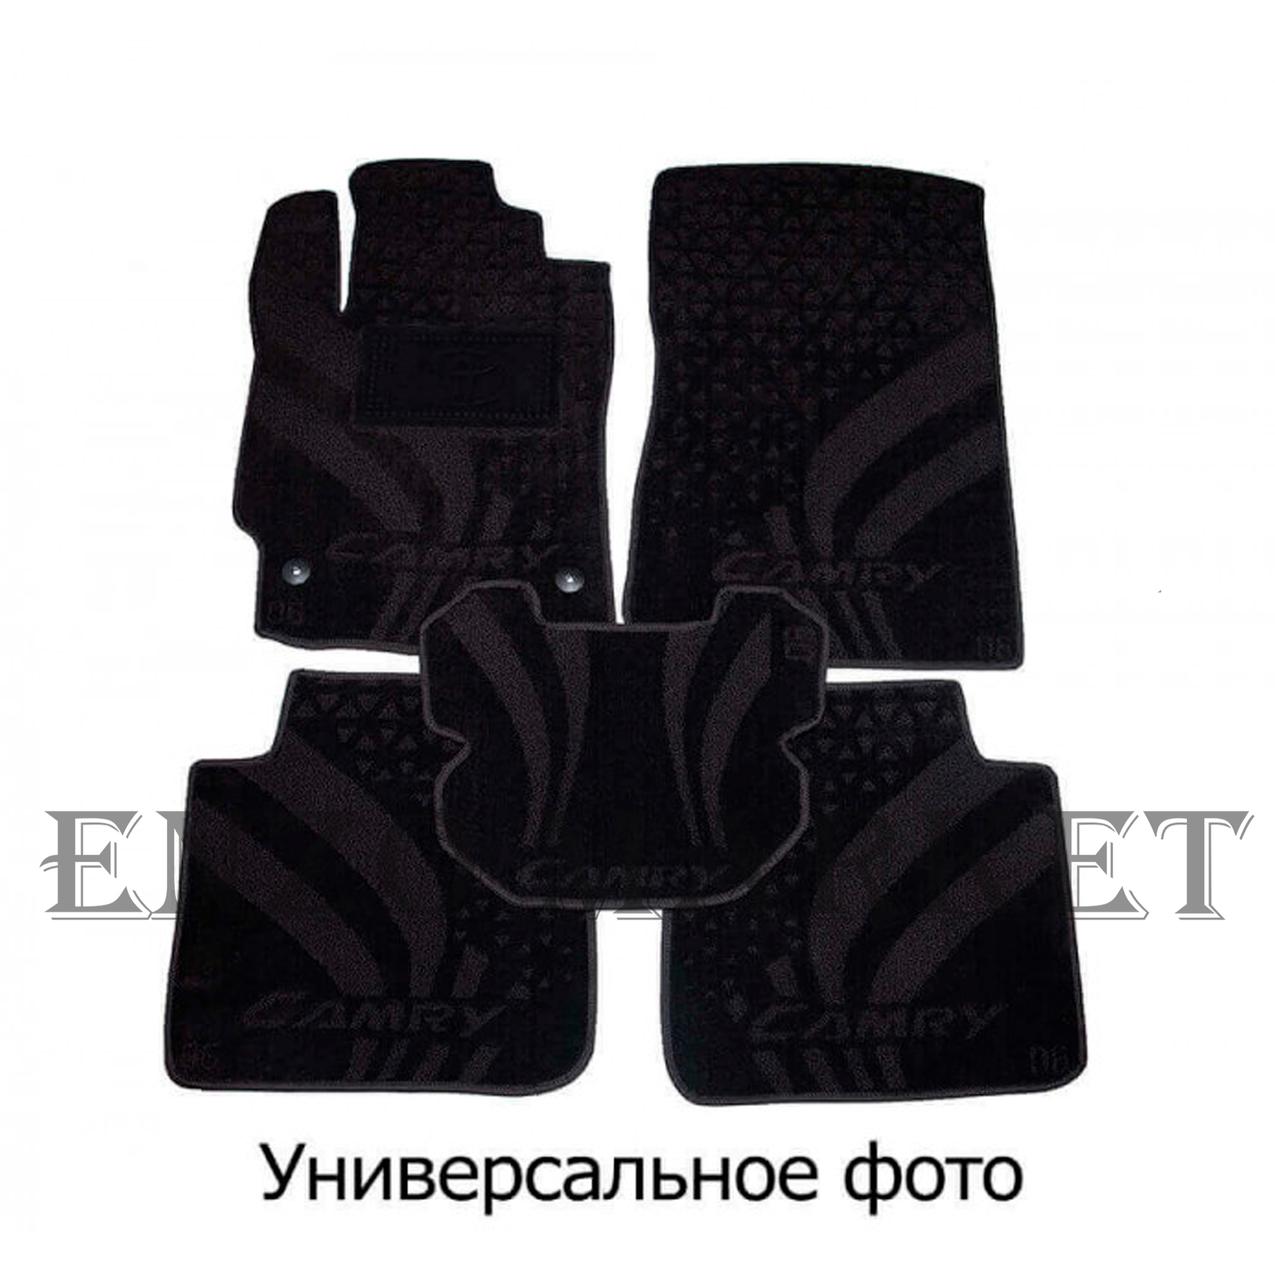 Текстильные автоковрики в салон Fiat Qubo/Fiorino 08-/Citroen Nemo 07-/Peugeot Bipper 08- (AVTO-Tex)